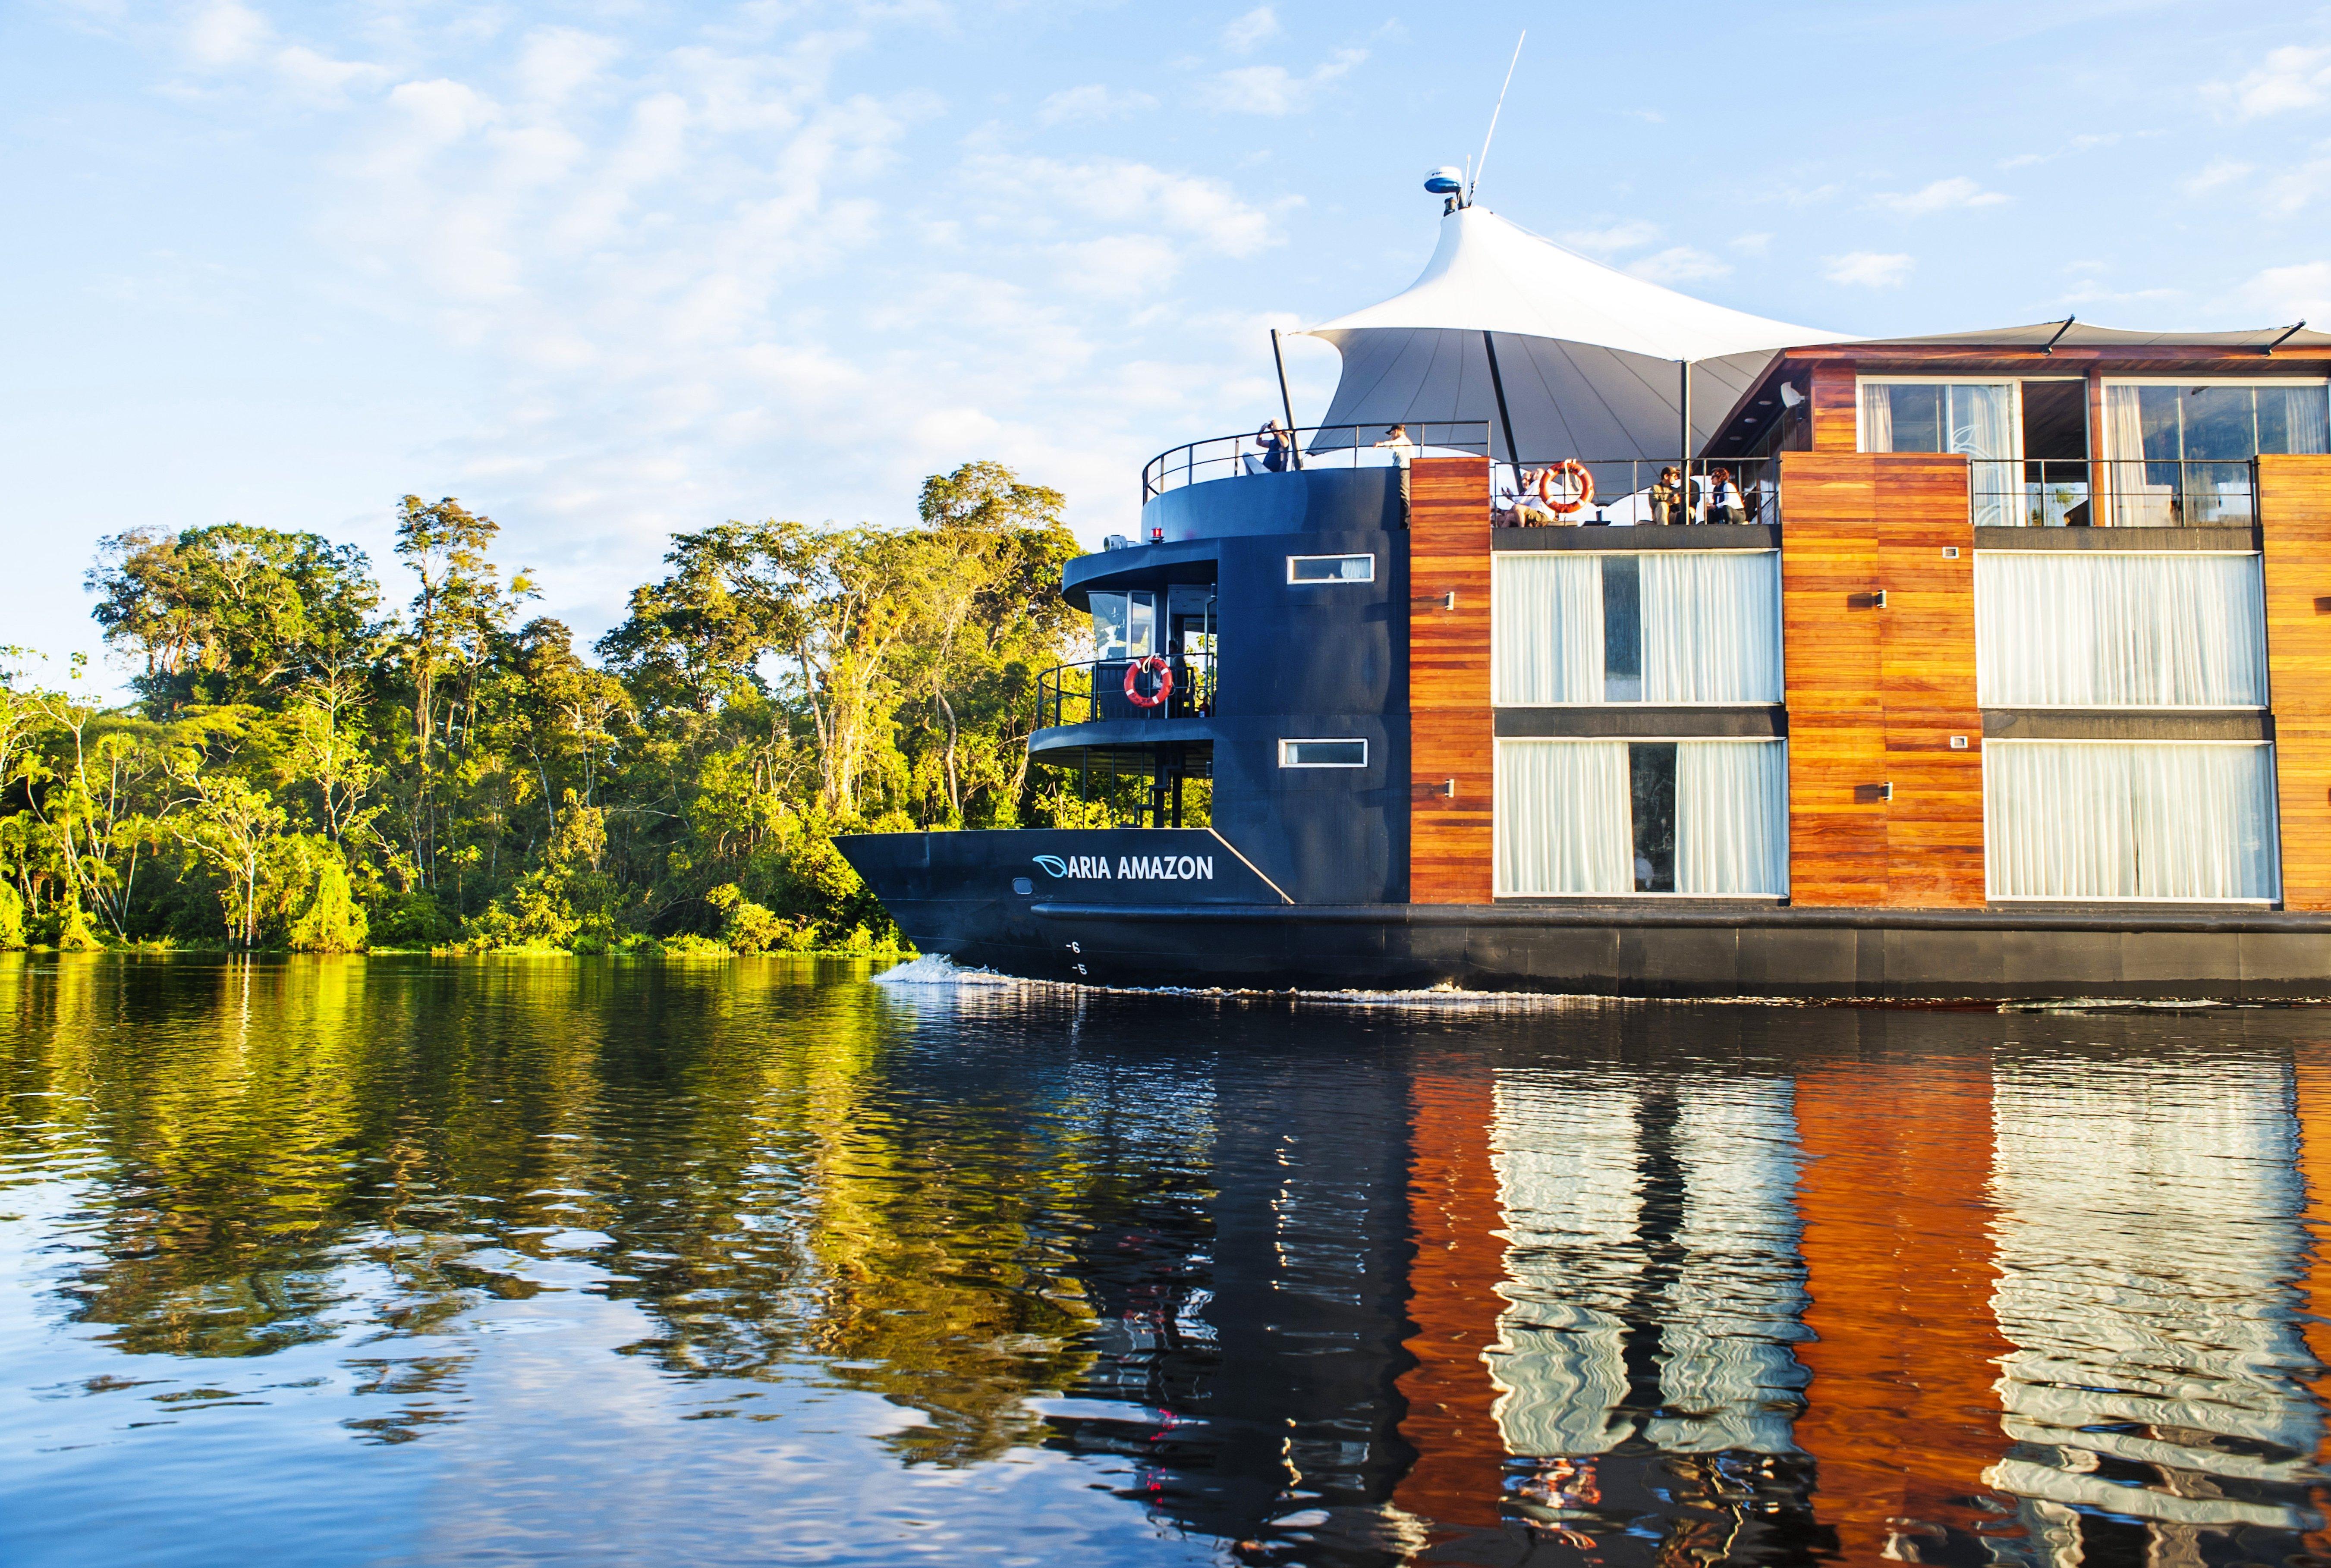 aria-amazon-luxury-river-cruise